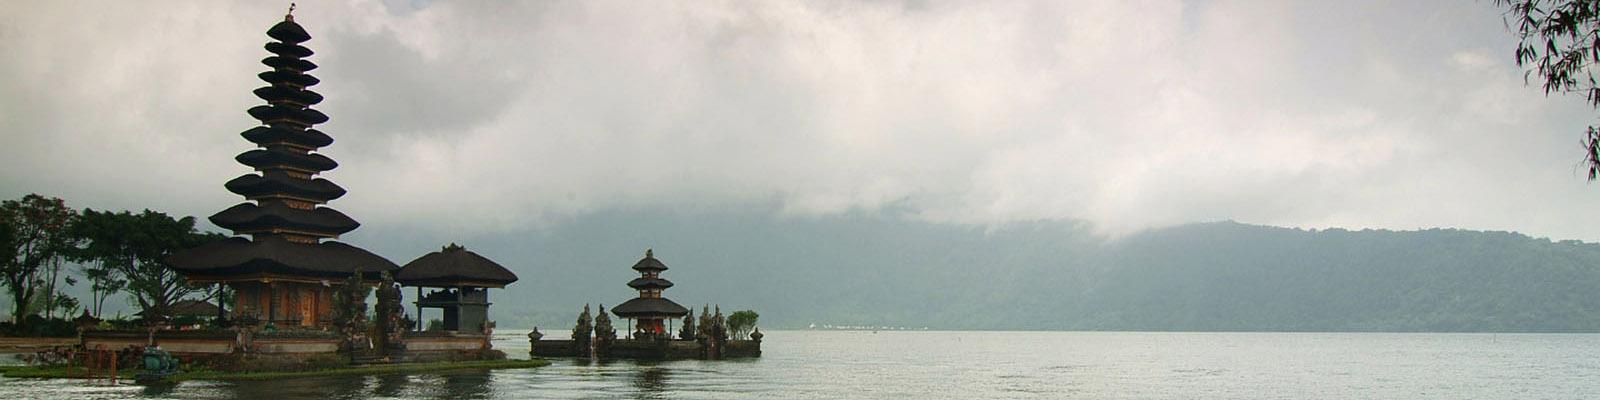 Pura Ulun Danau Bratan